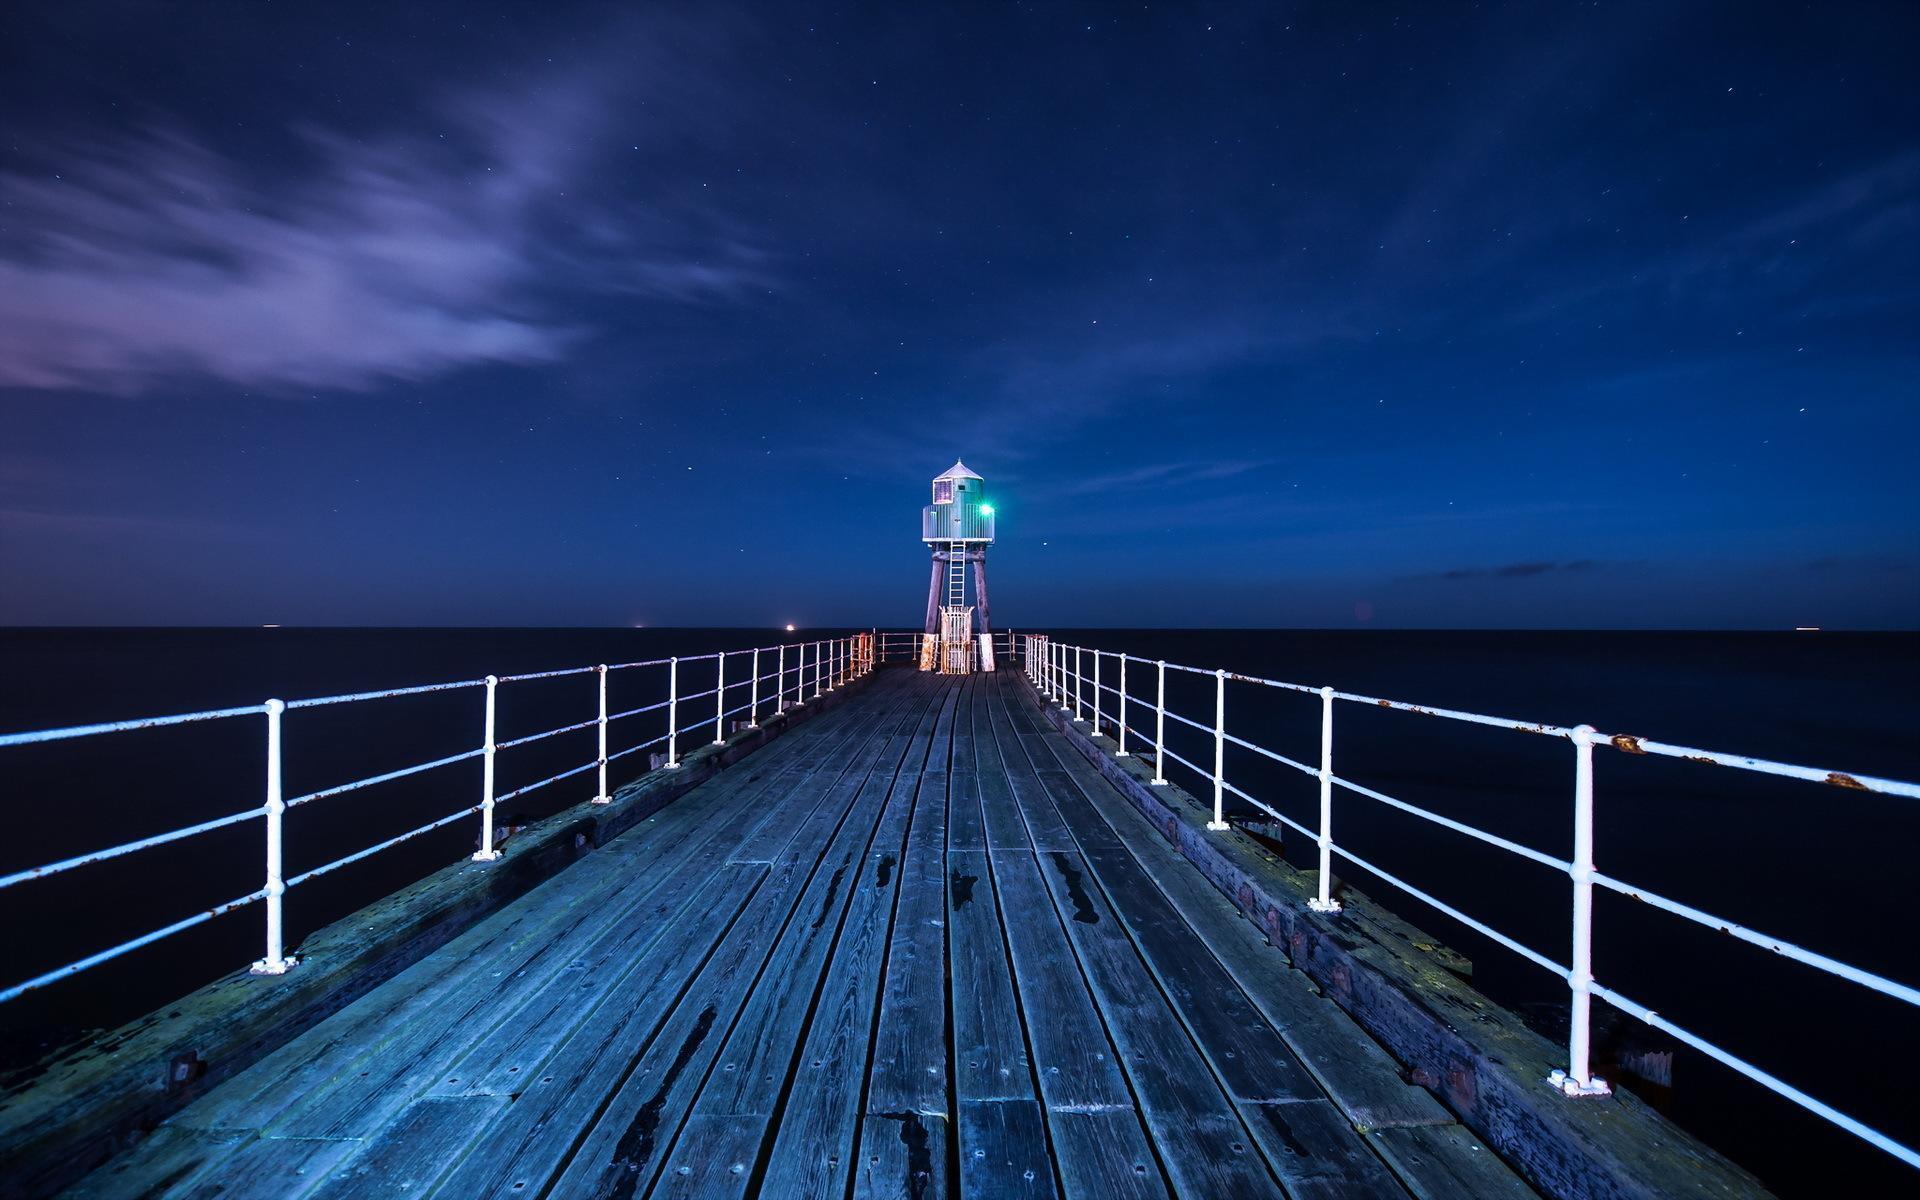 причал фонари берег море pier lights shore sea  № 2555079 без смс